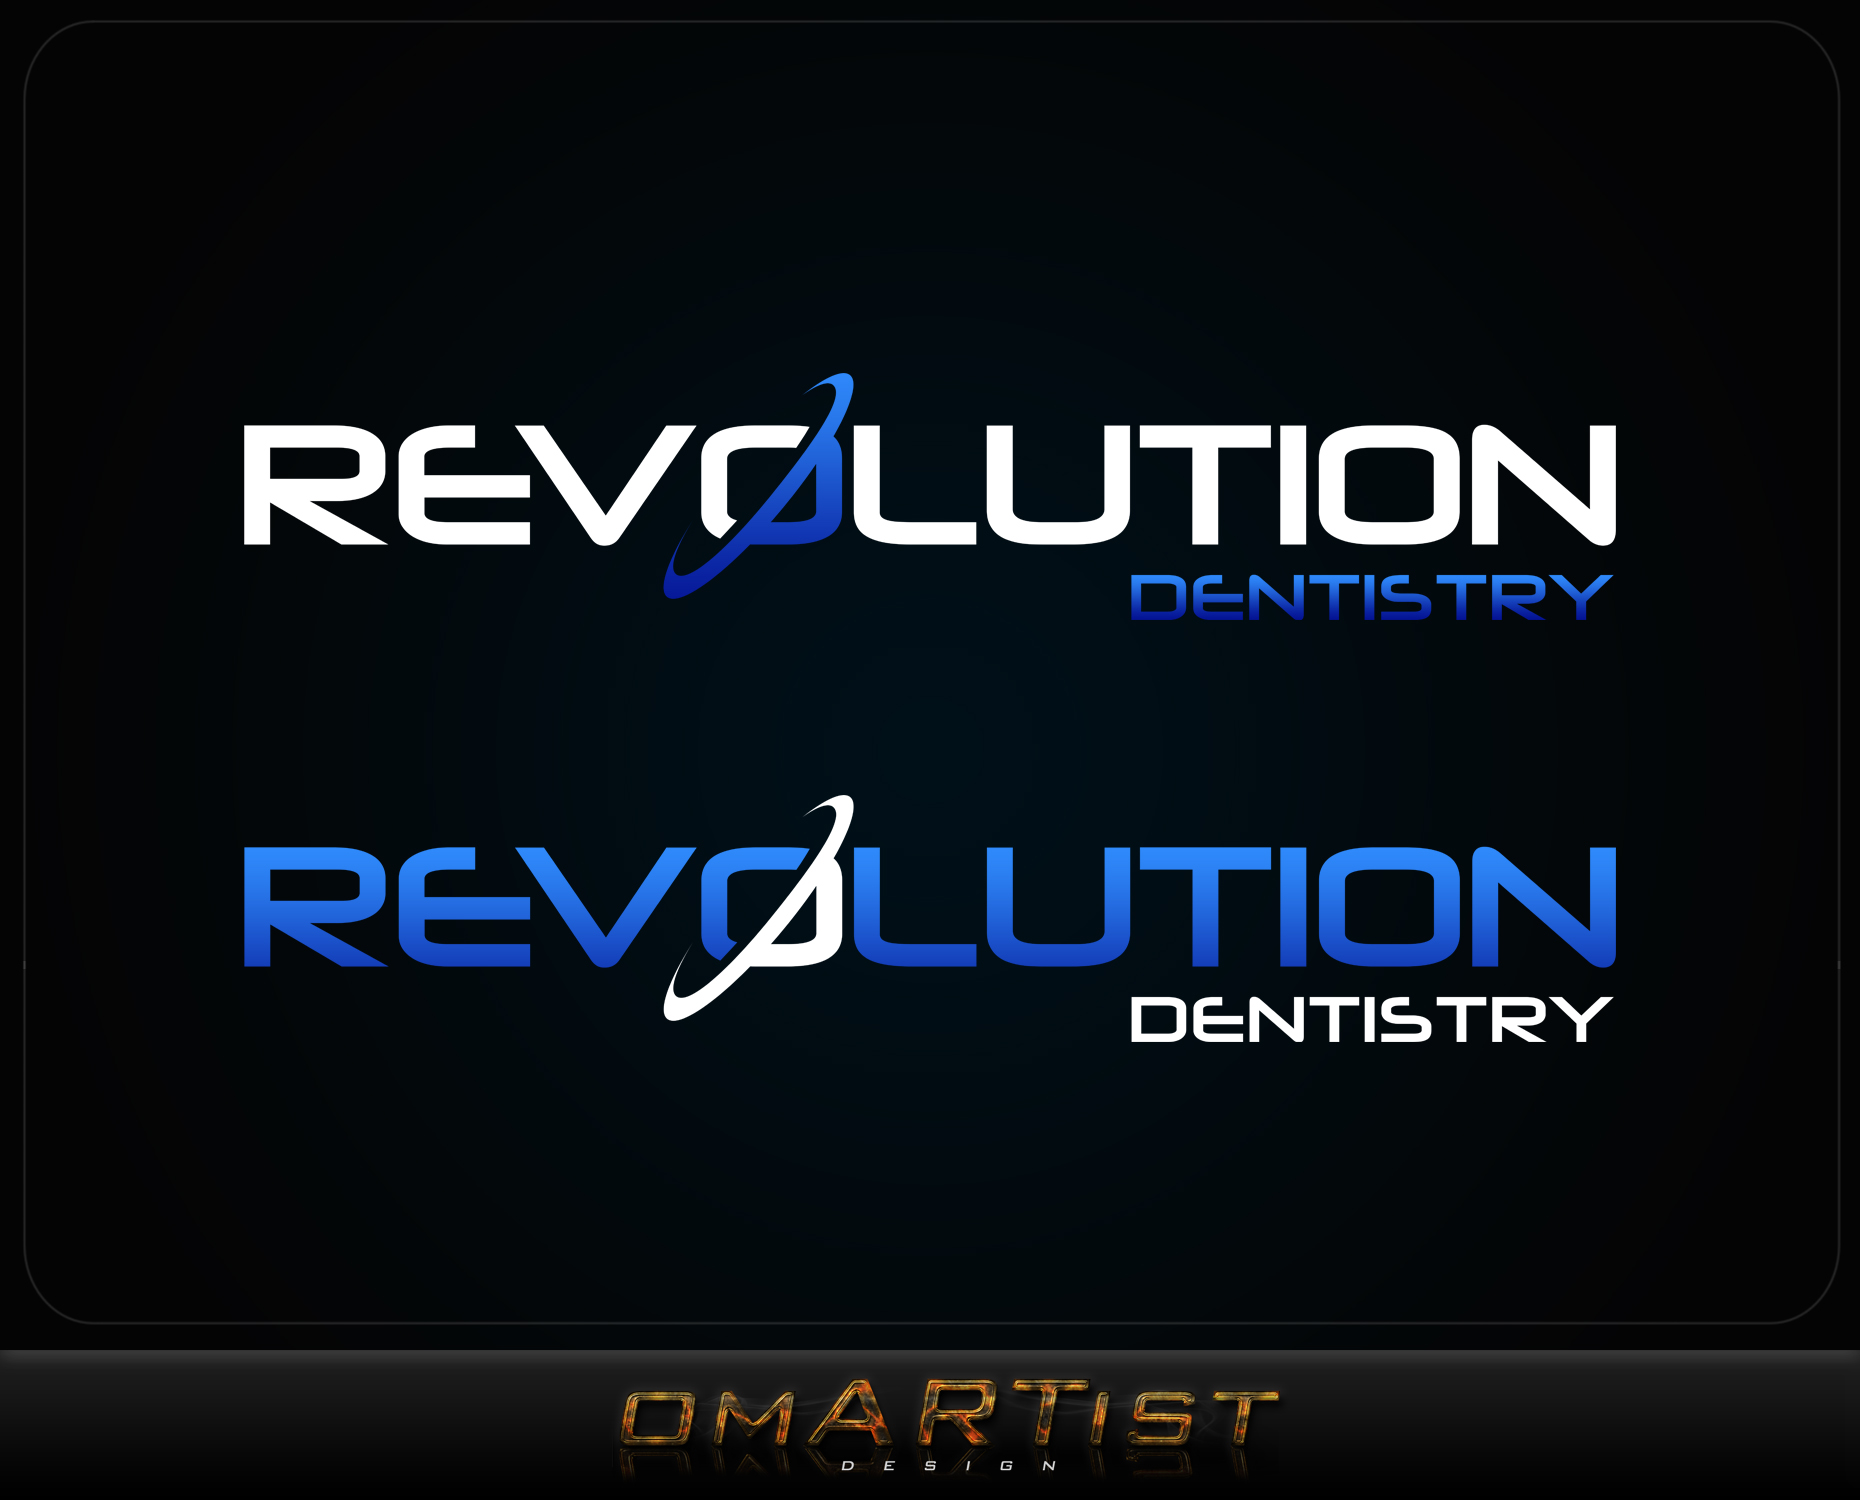 Logo Design by omARTist - Entry No. 273 in the Logo Design Contest Artistic Logo Design for Revolution Dentistry.